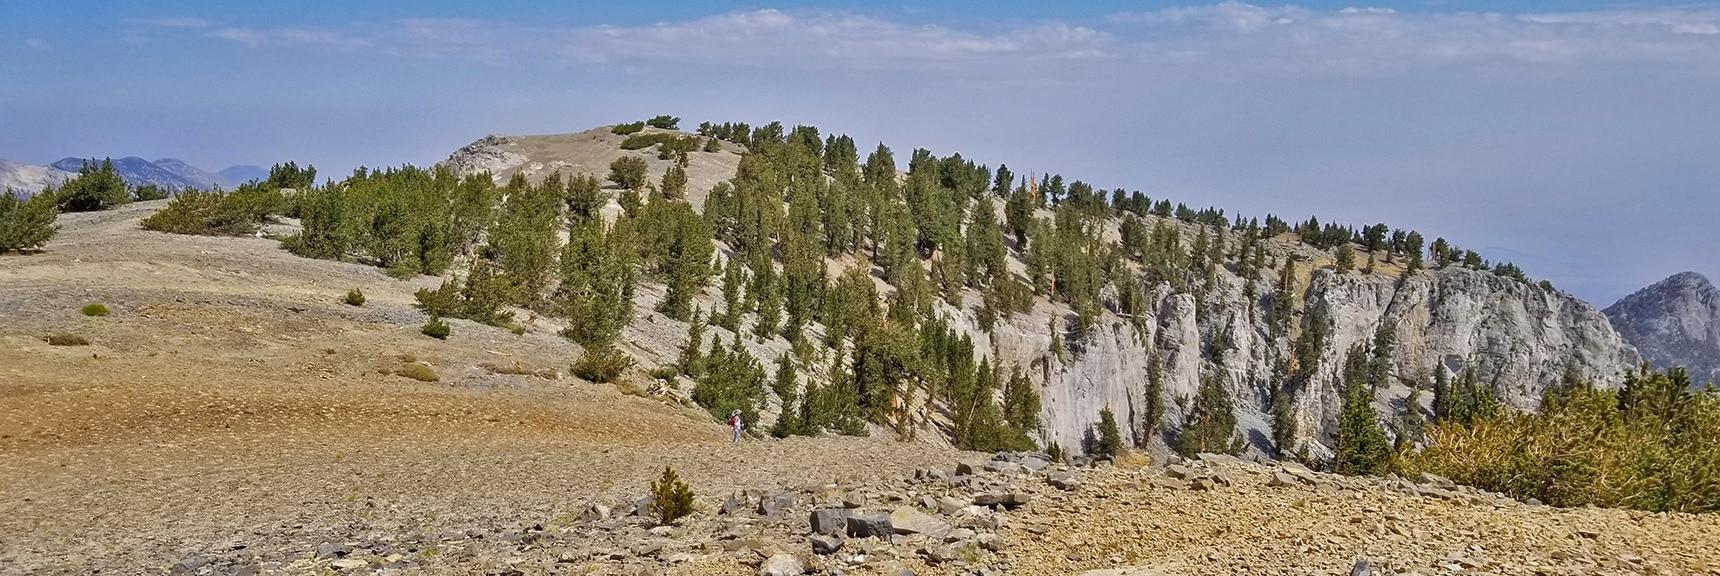 Mummy Mountain's NE Cliff Chute Follows the Base of the Cliffs Ahead | Mummy Mountain NE Cliffs Descent | Mt Charleston Wilderness | Spring Mountains, Nevada